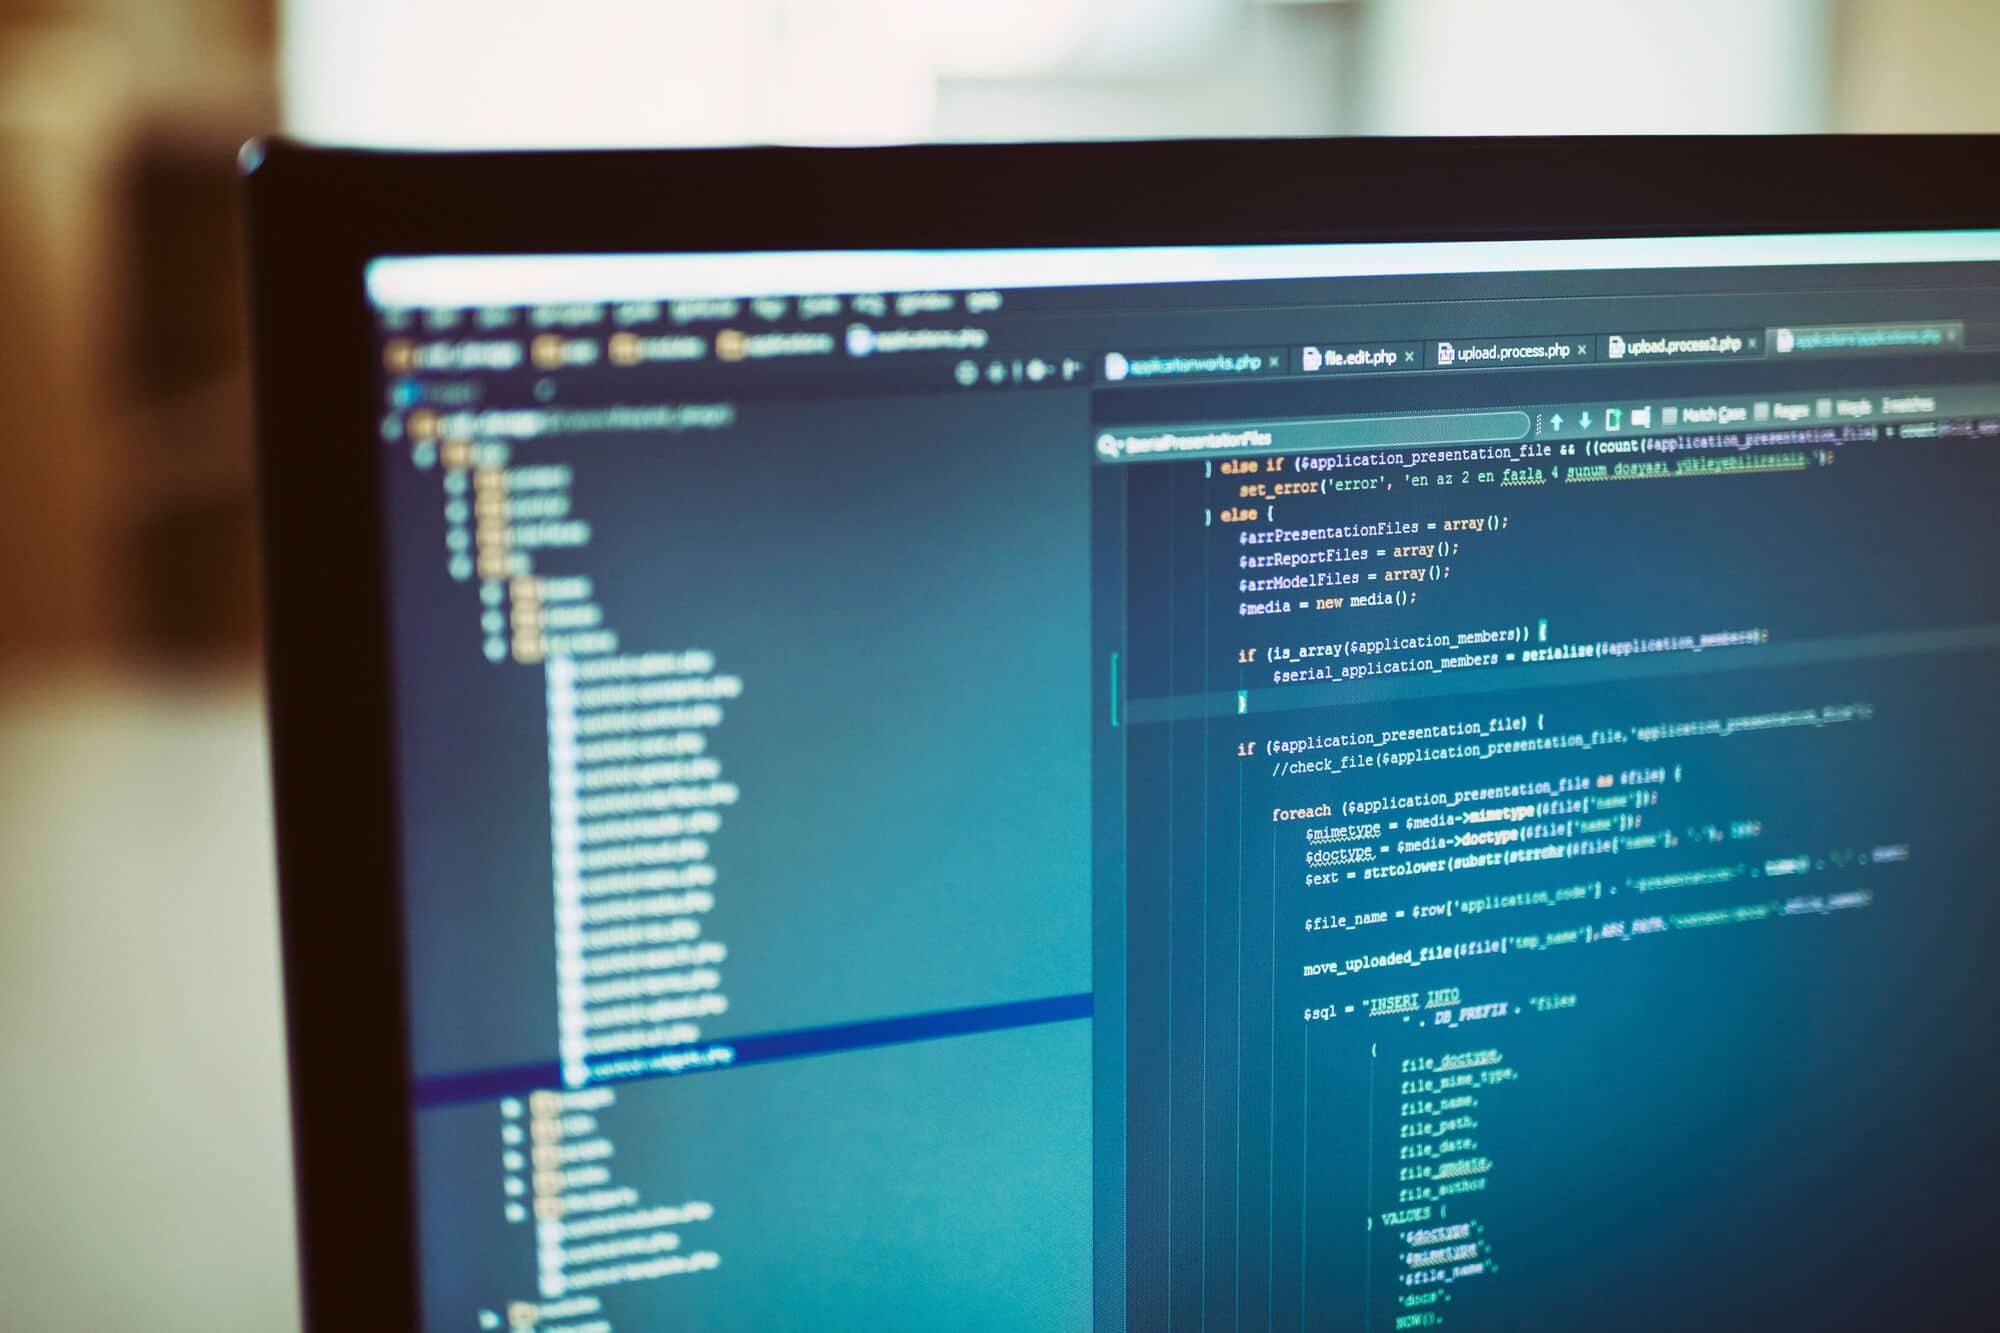 New Orleans Web Development Services - Big Easy SEO